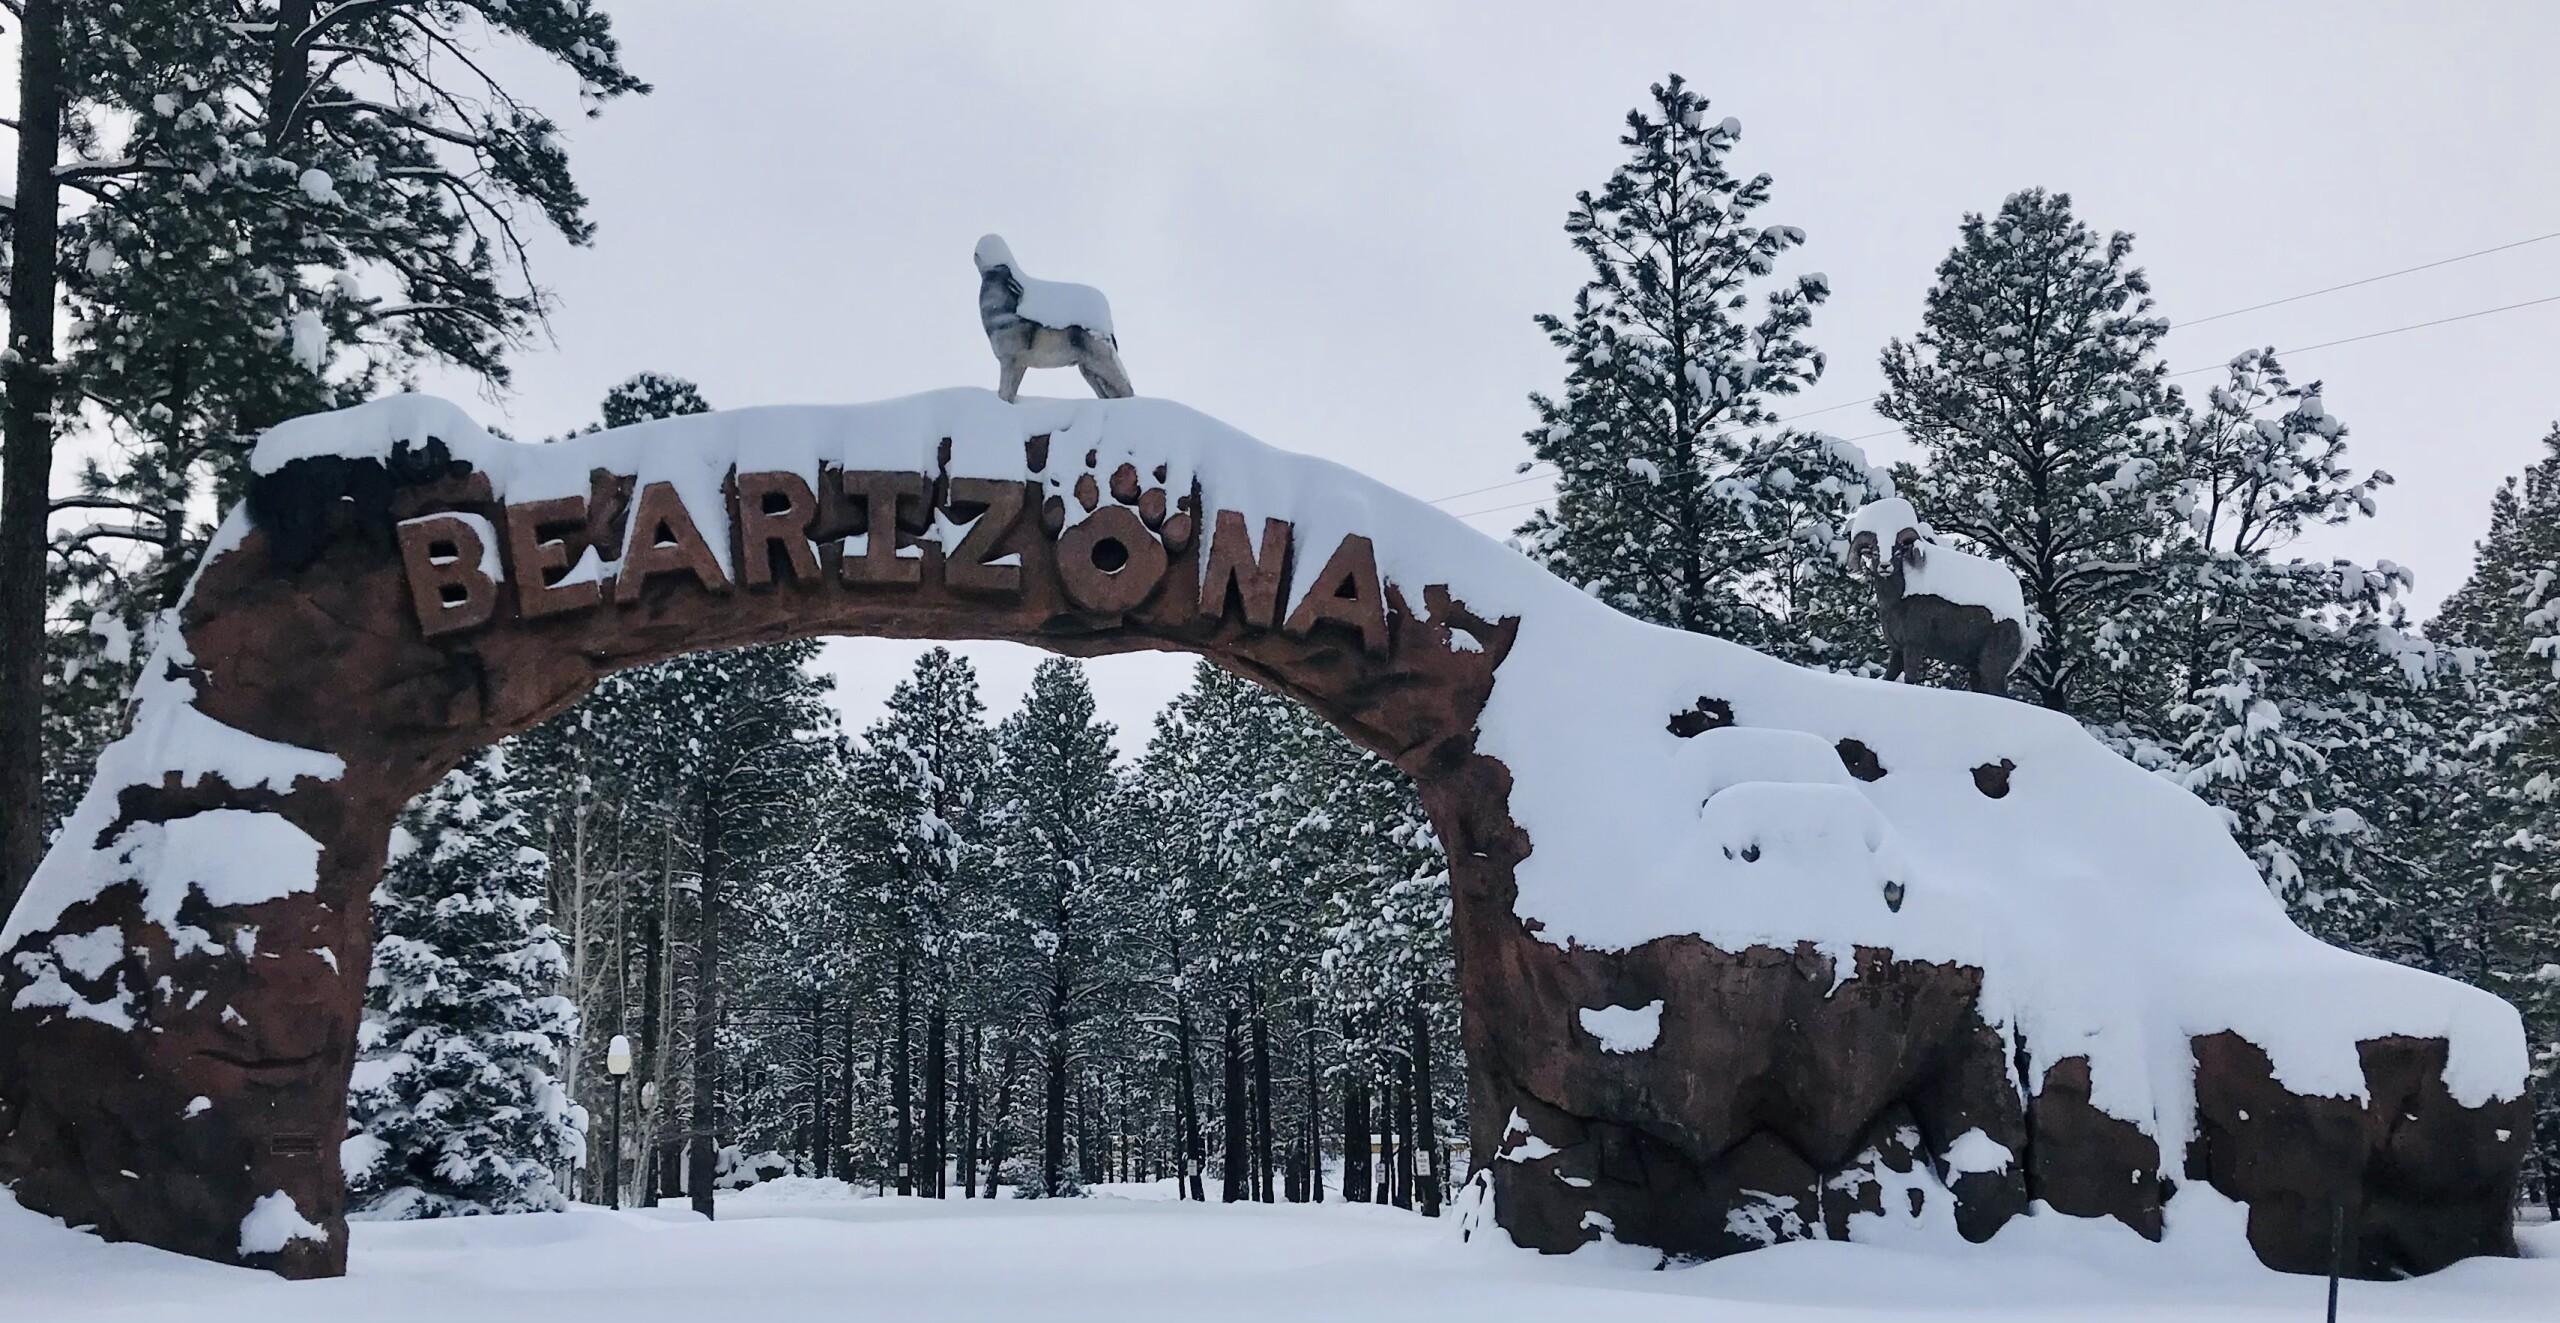 Bearizona Wildlife Park in Northern Arizona